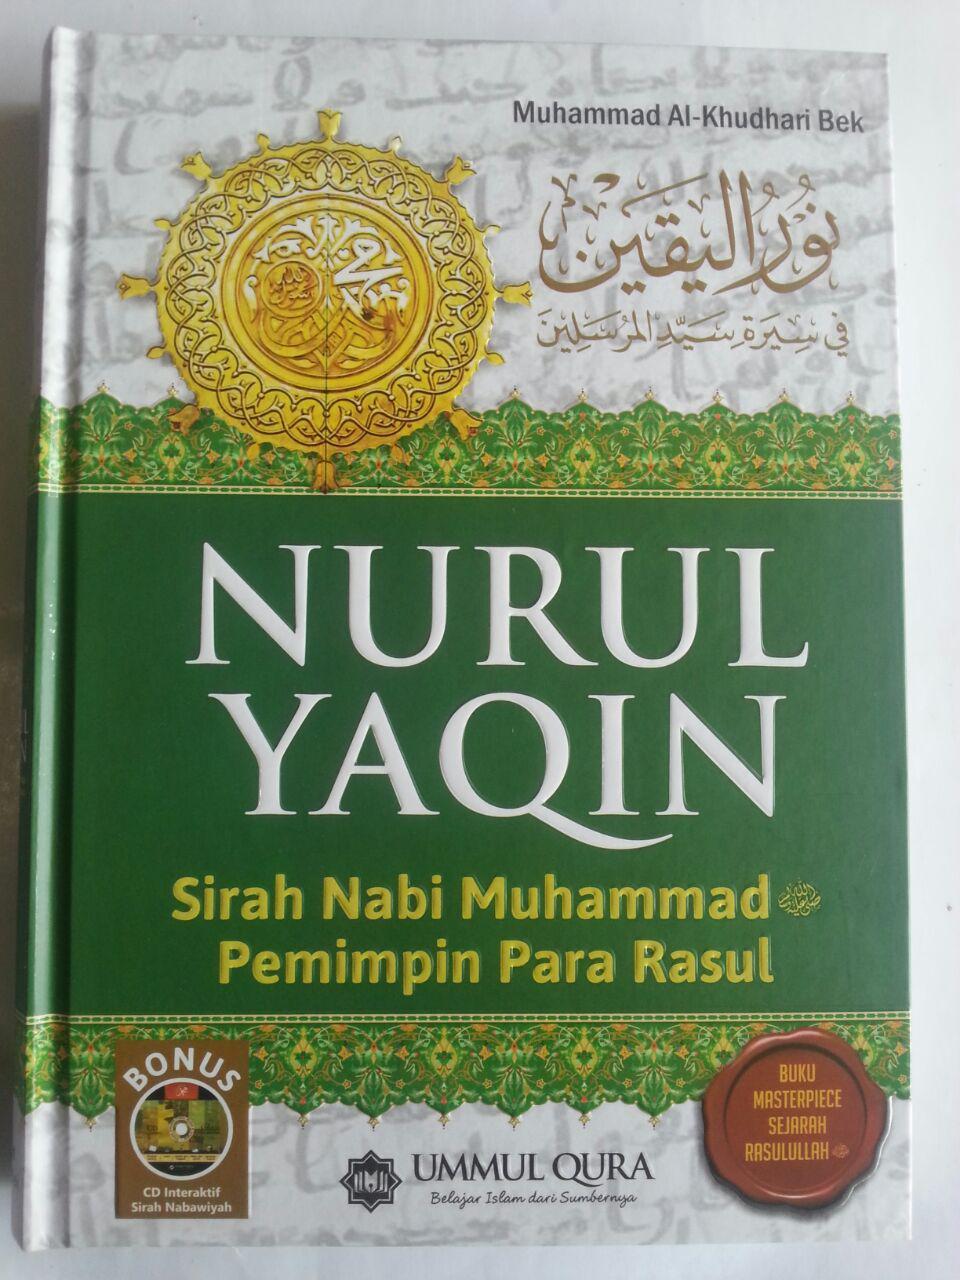 Buku Nurul Yakin Sirah Nabi Muhammad Pemimpin Para Rasul cover 2